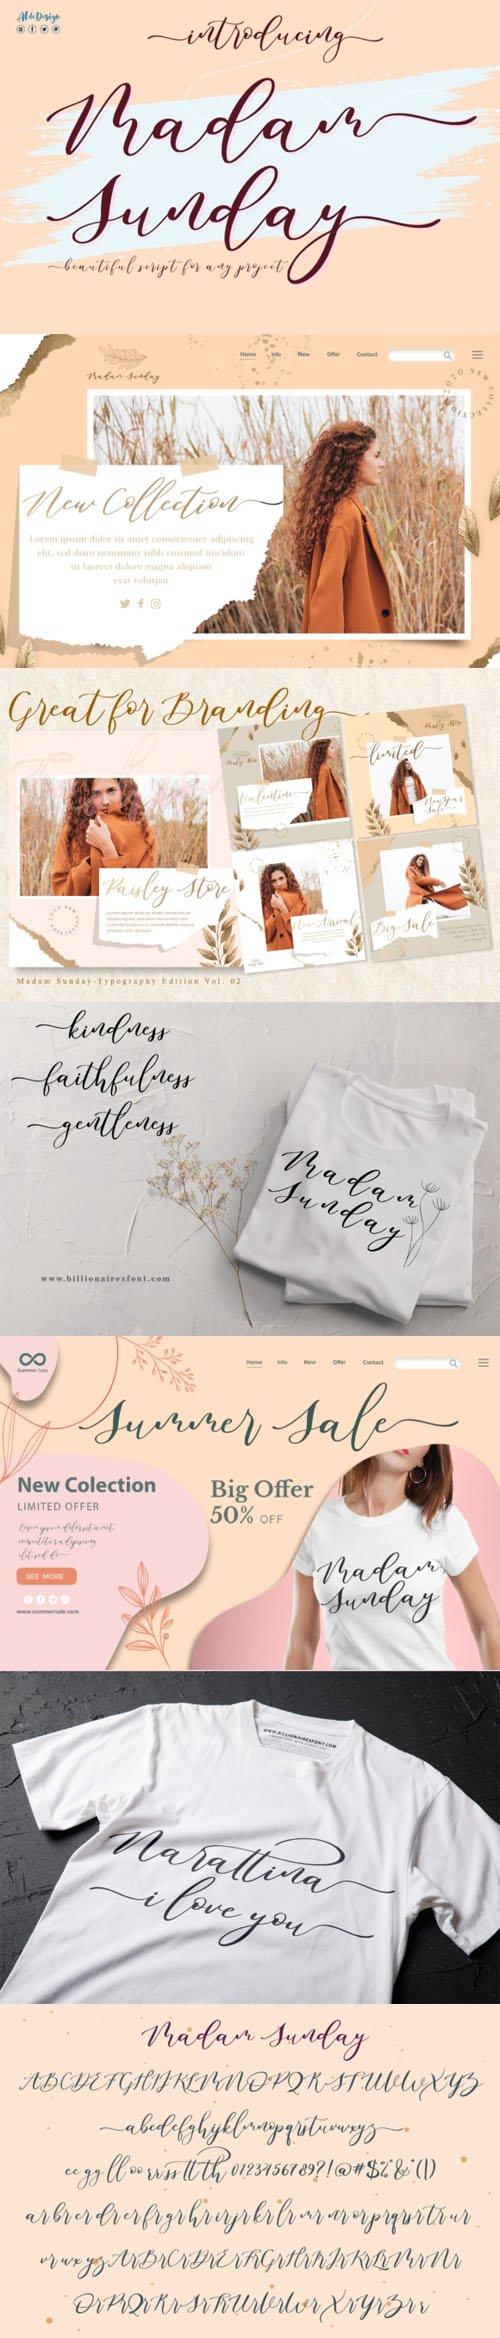 Madam Sunday - Romantic Calligraphy Typeface [2-Weights]